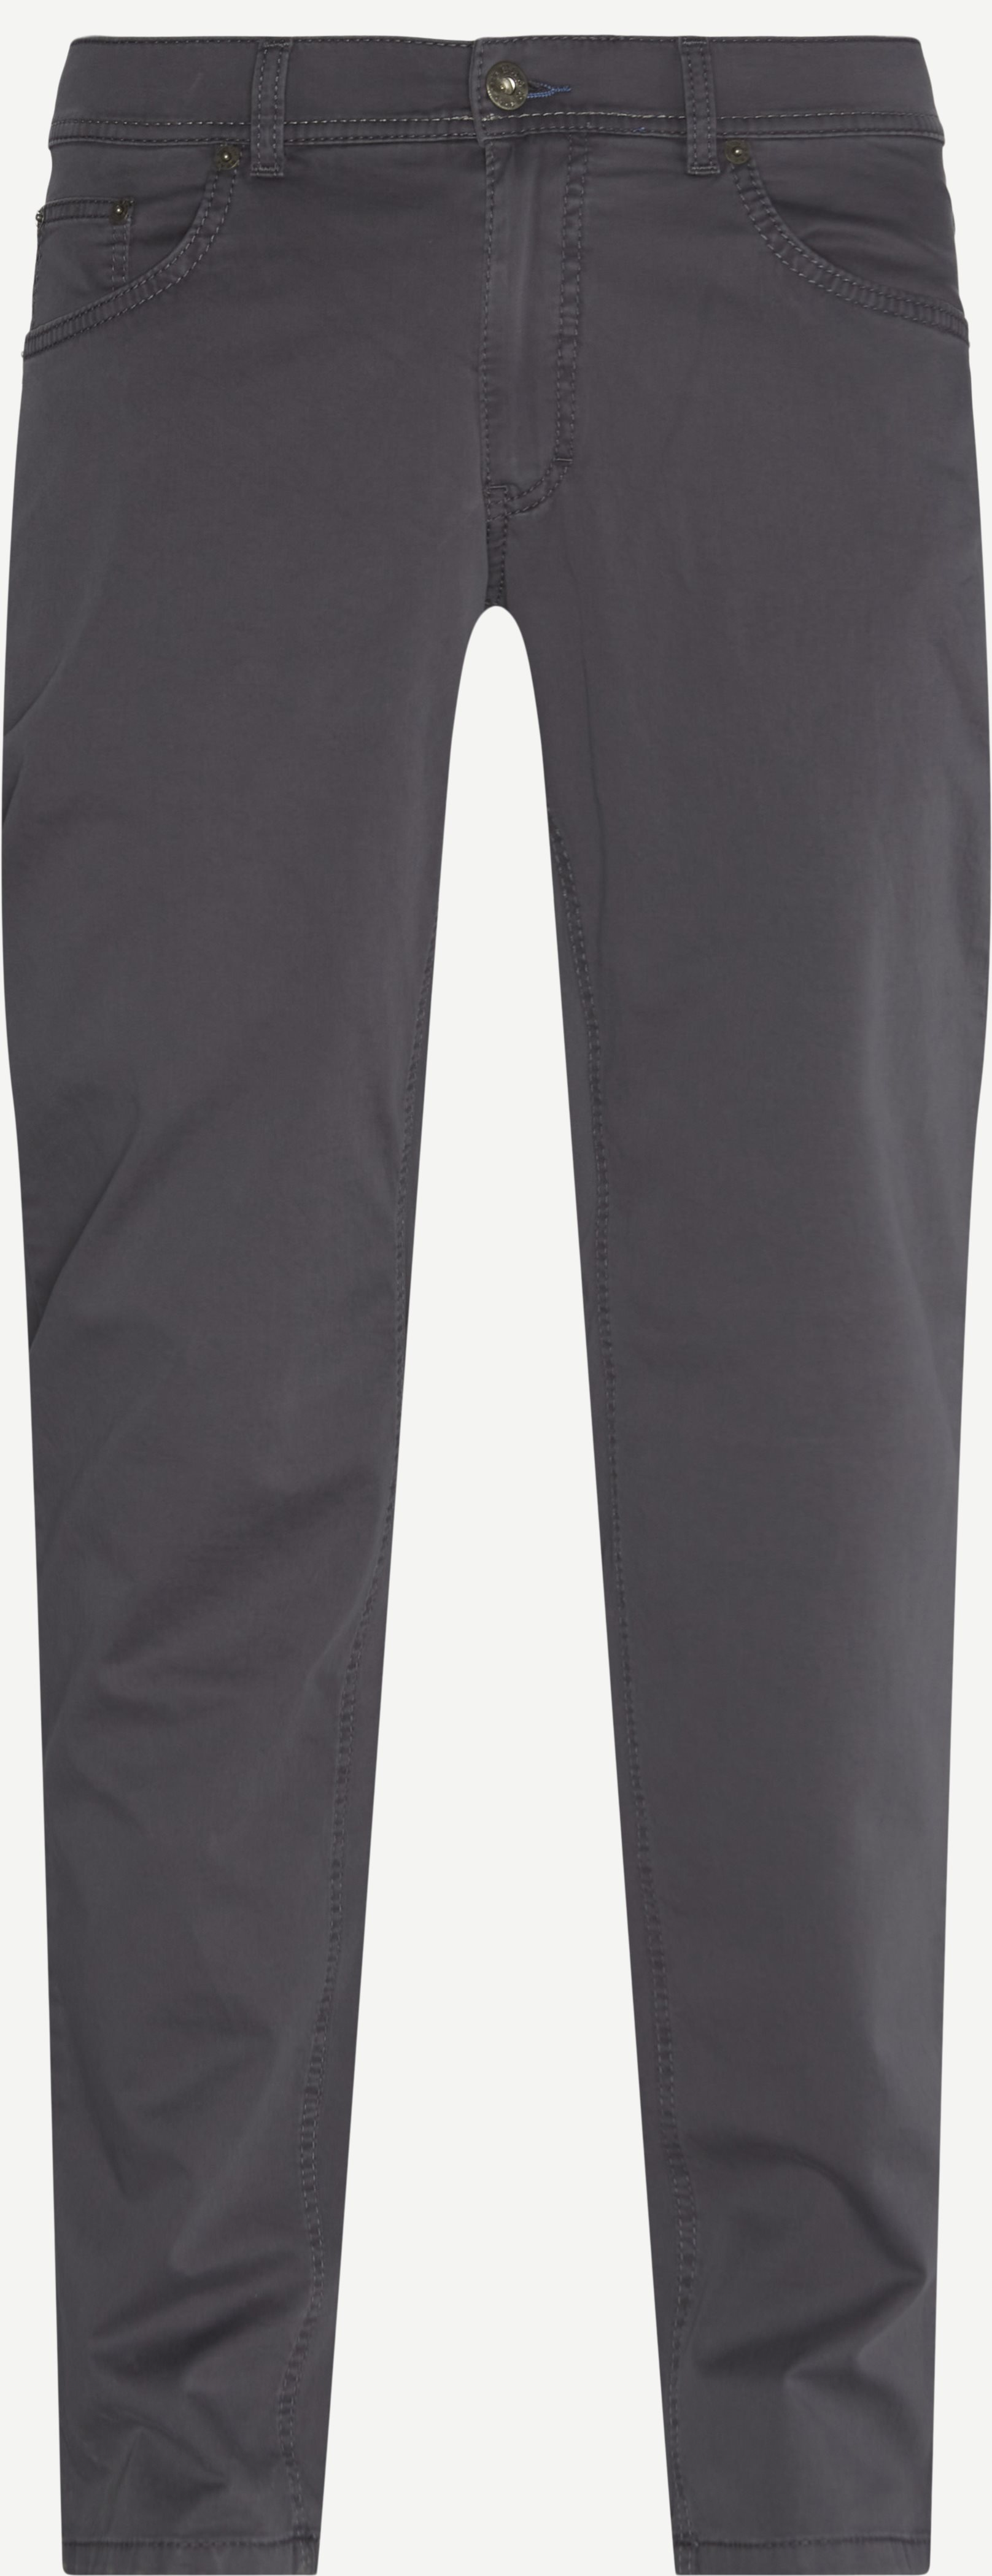 Jeans - Grey